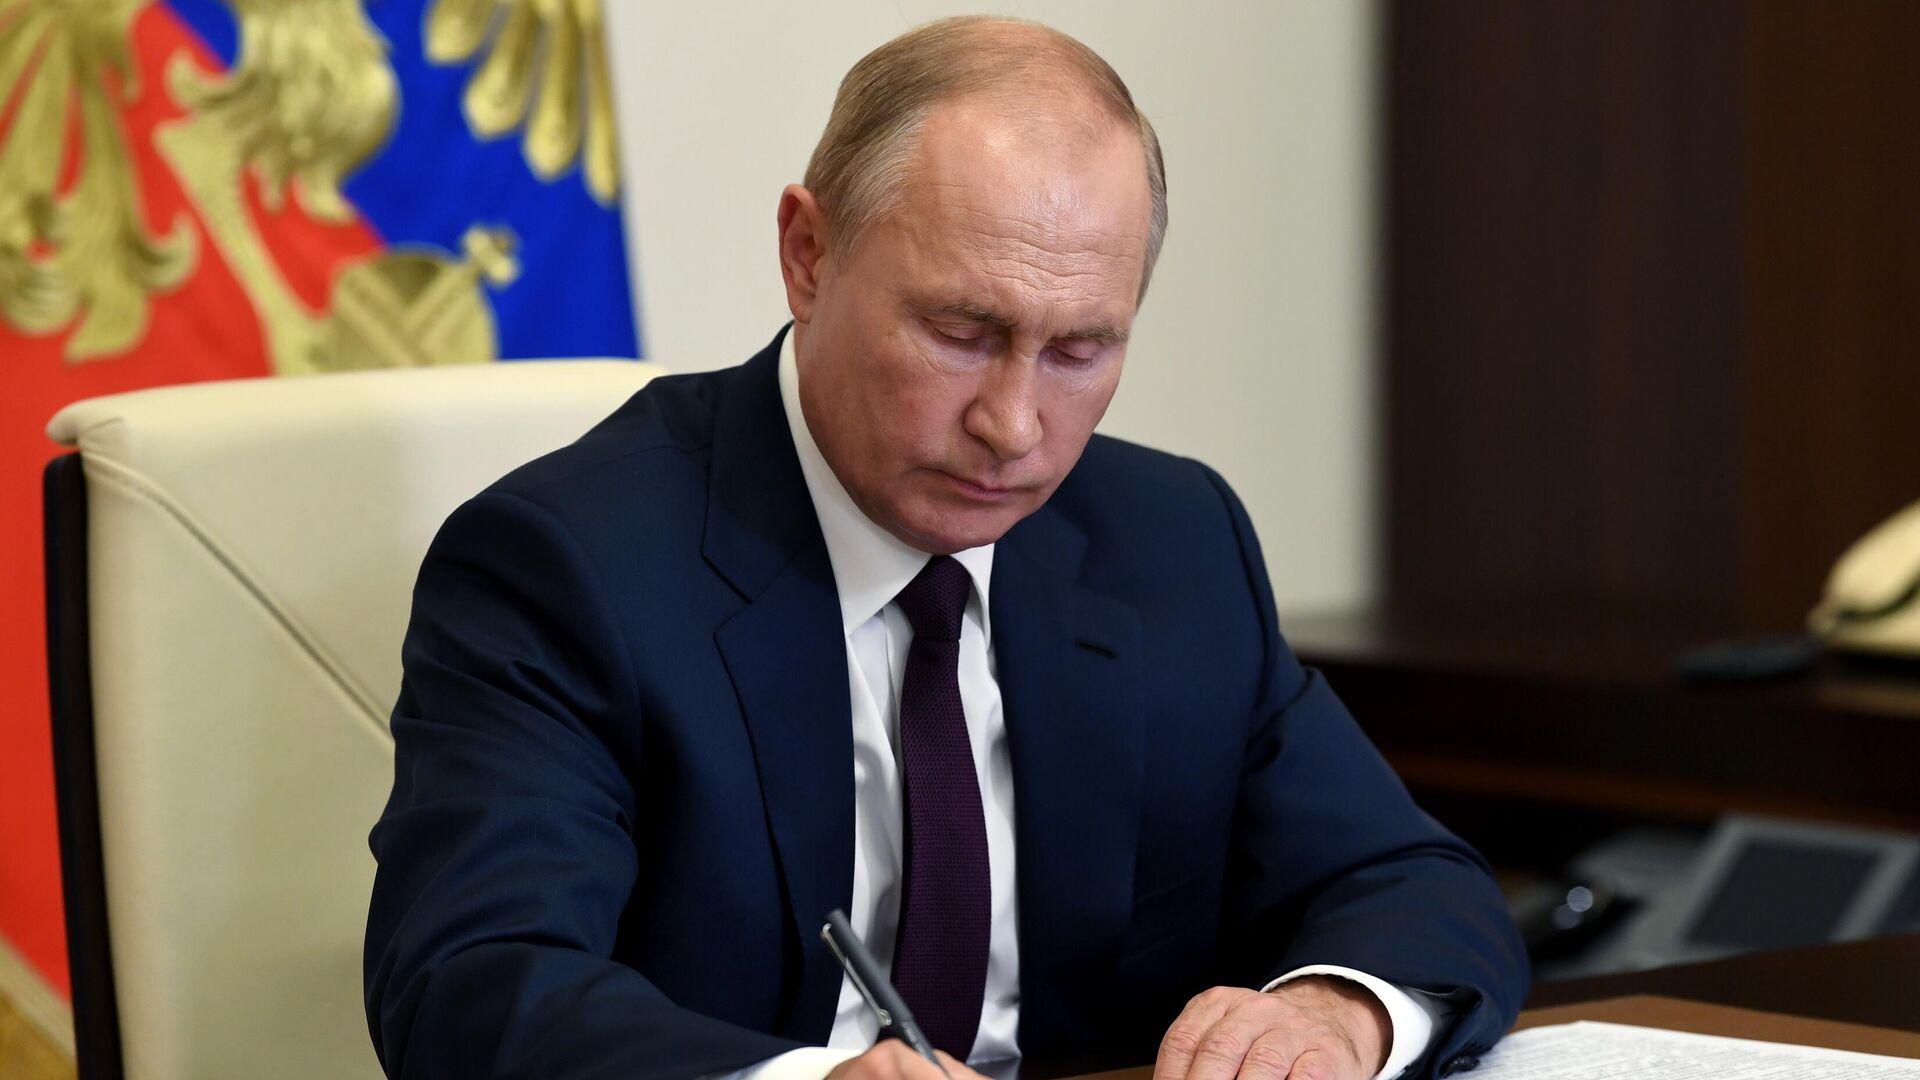 Президент РФ Владимир Путин - РИА Новости, 1920, 08.09.2020